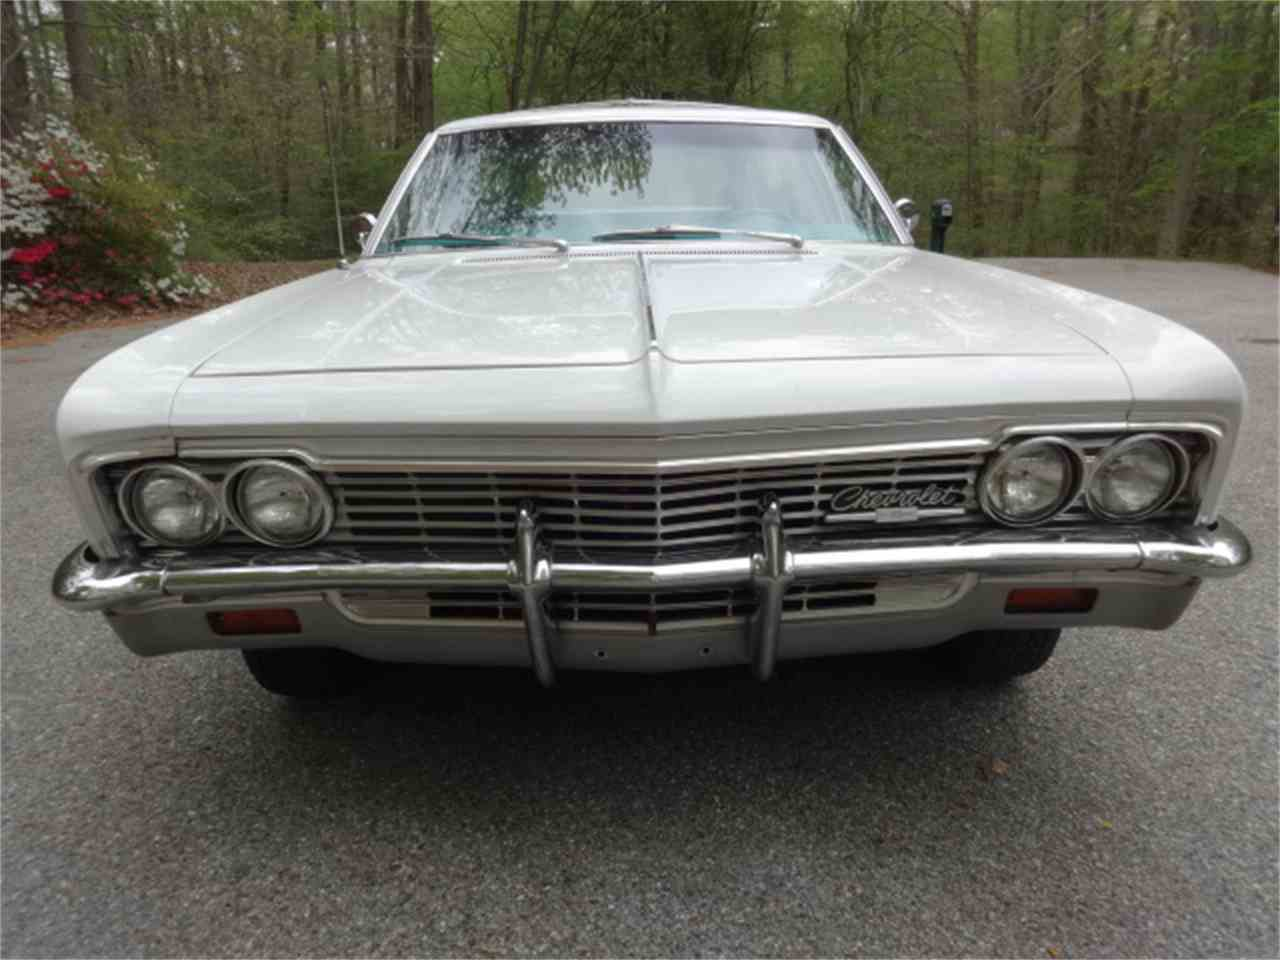 Impala 1966 chevrolet impala : 1966 Chevrolet Impala for Sale   ClassicCars.com   CC-905487